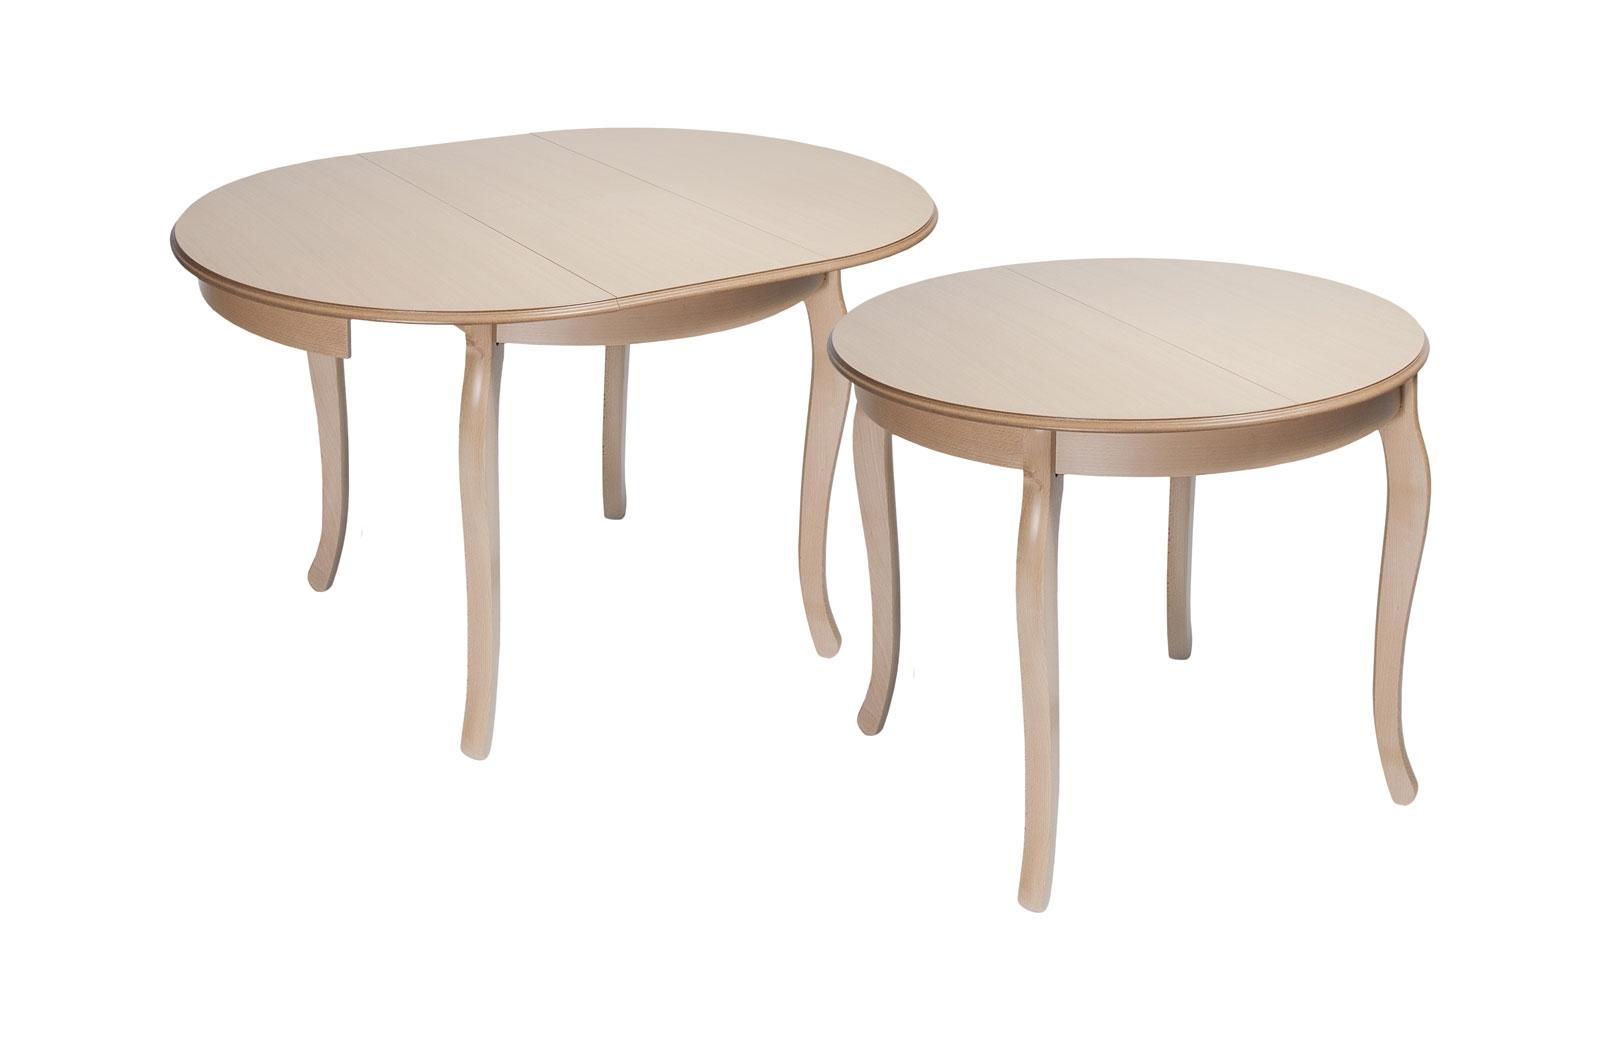 Стол обеденный Азалия К 900 - 5771